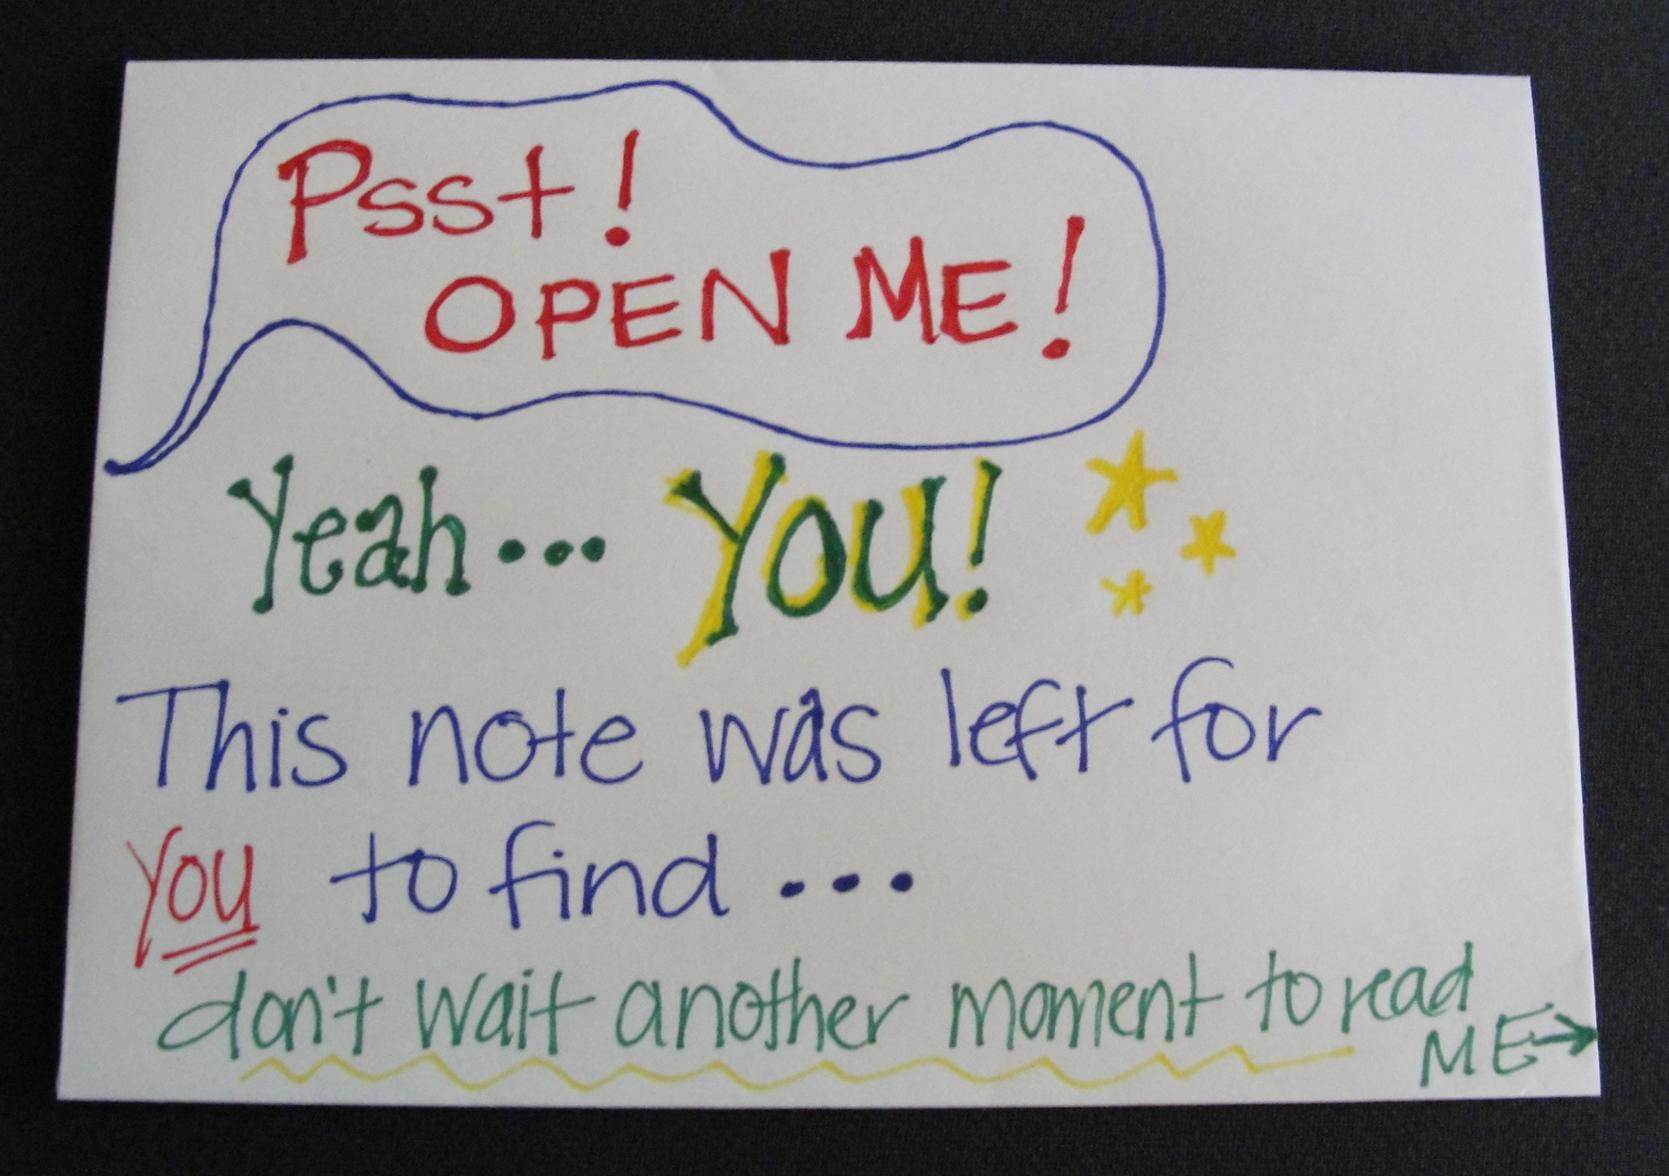 Image from naturespeaceandhope.wordpress.com